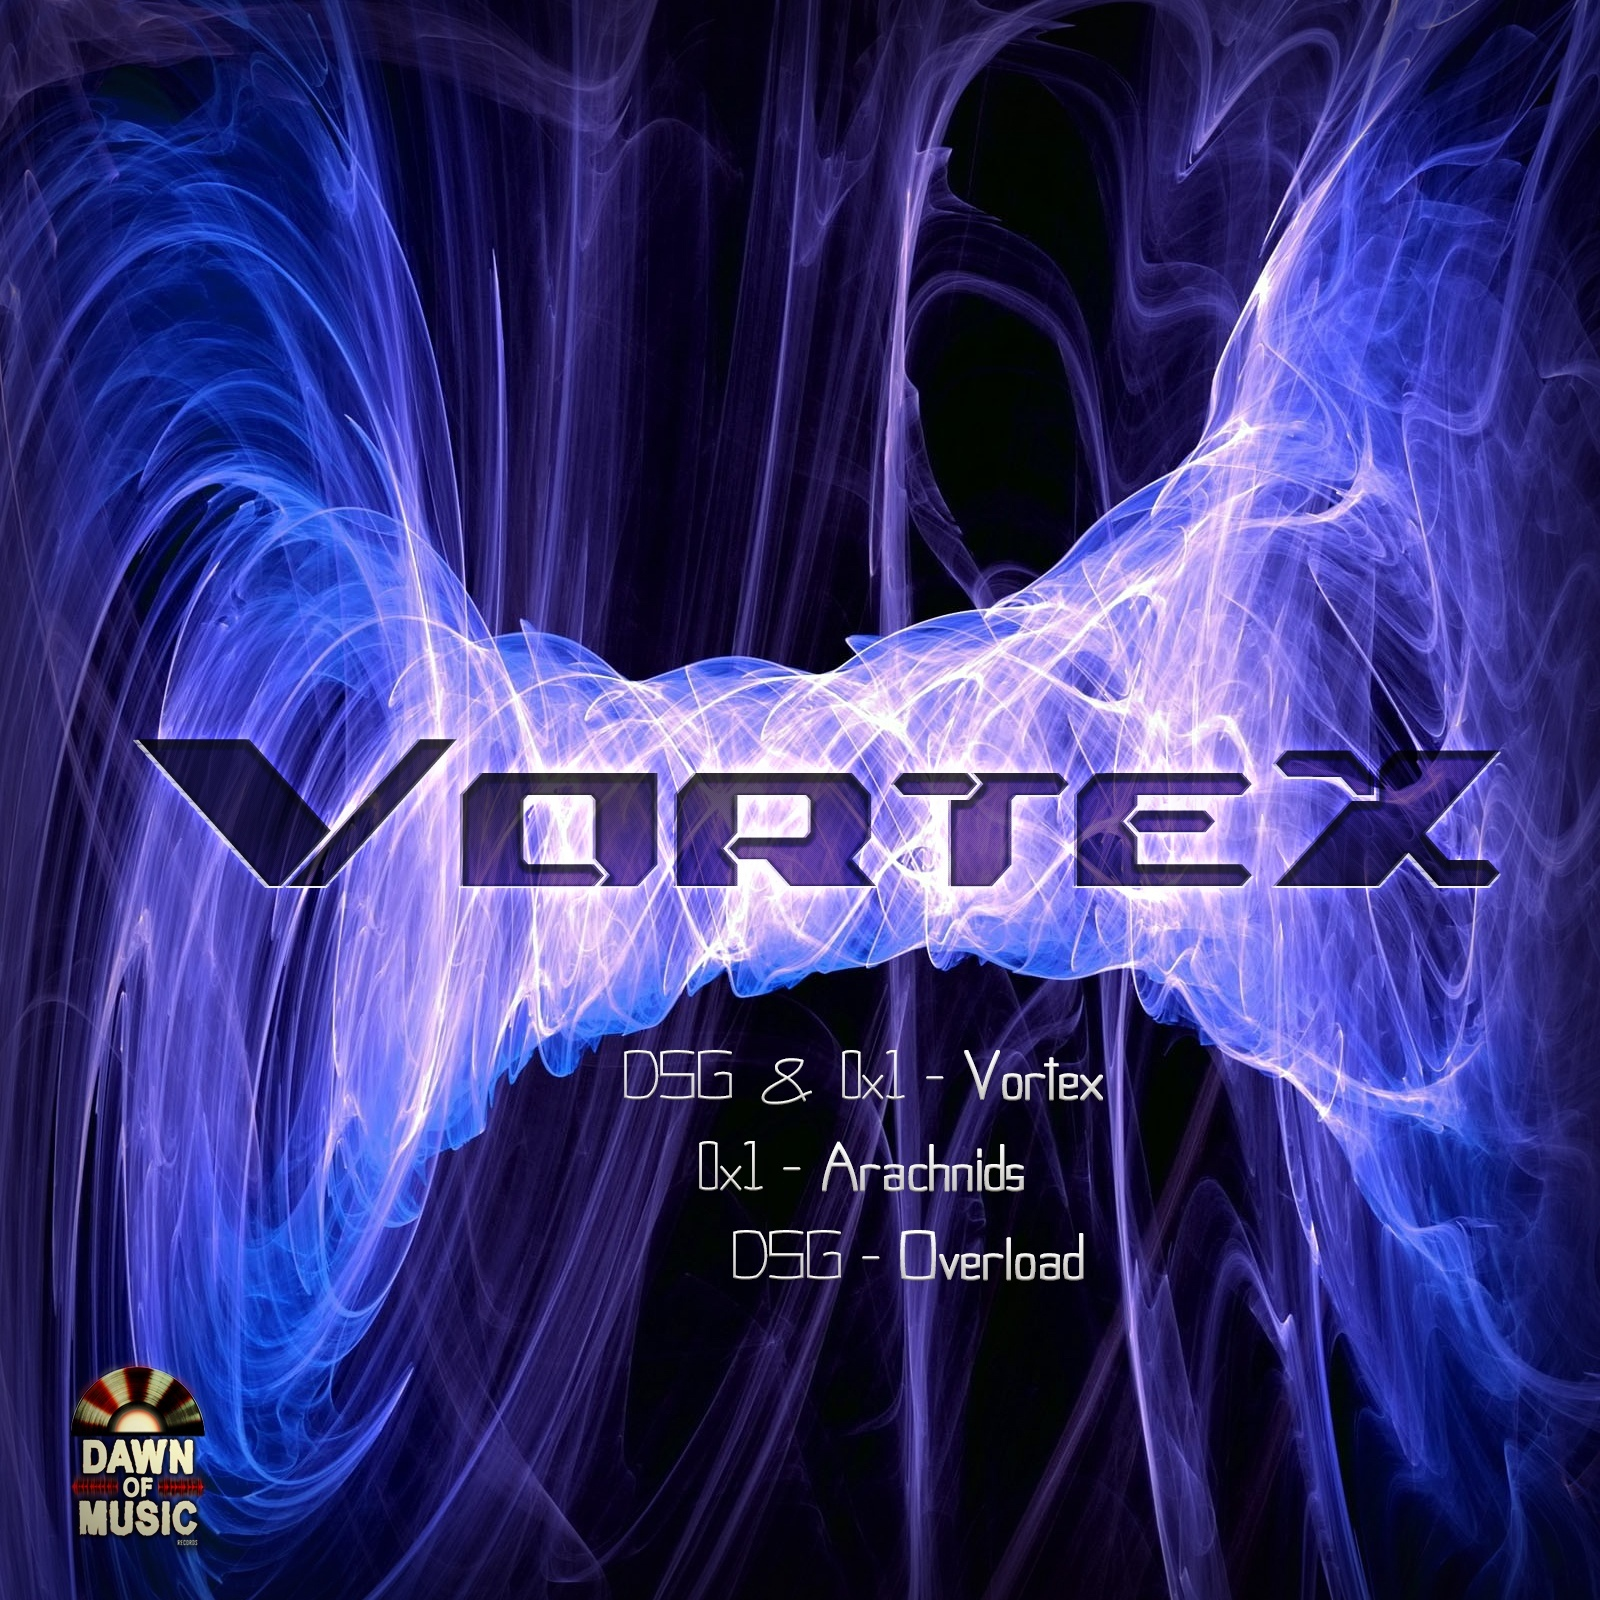 0x1 & DSG - Vortex